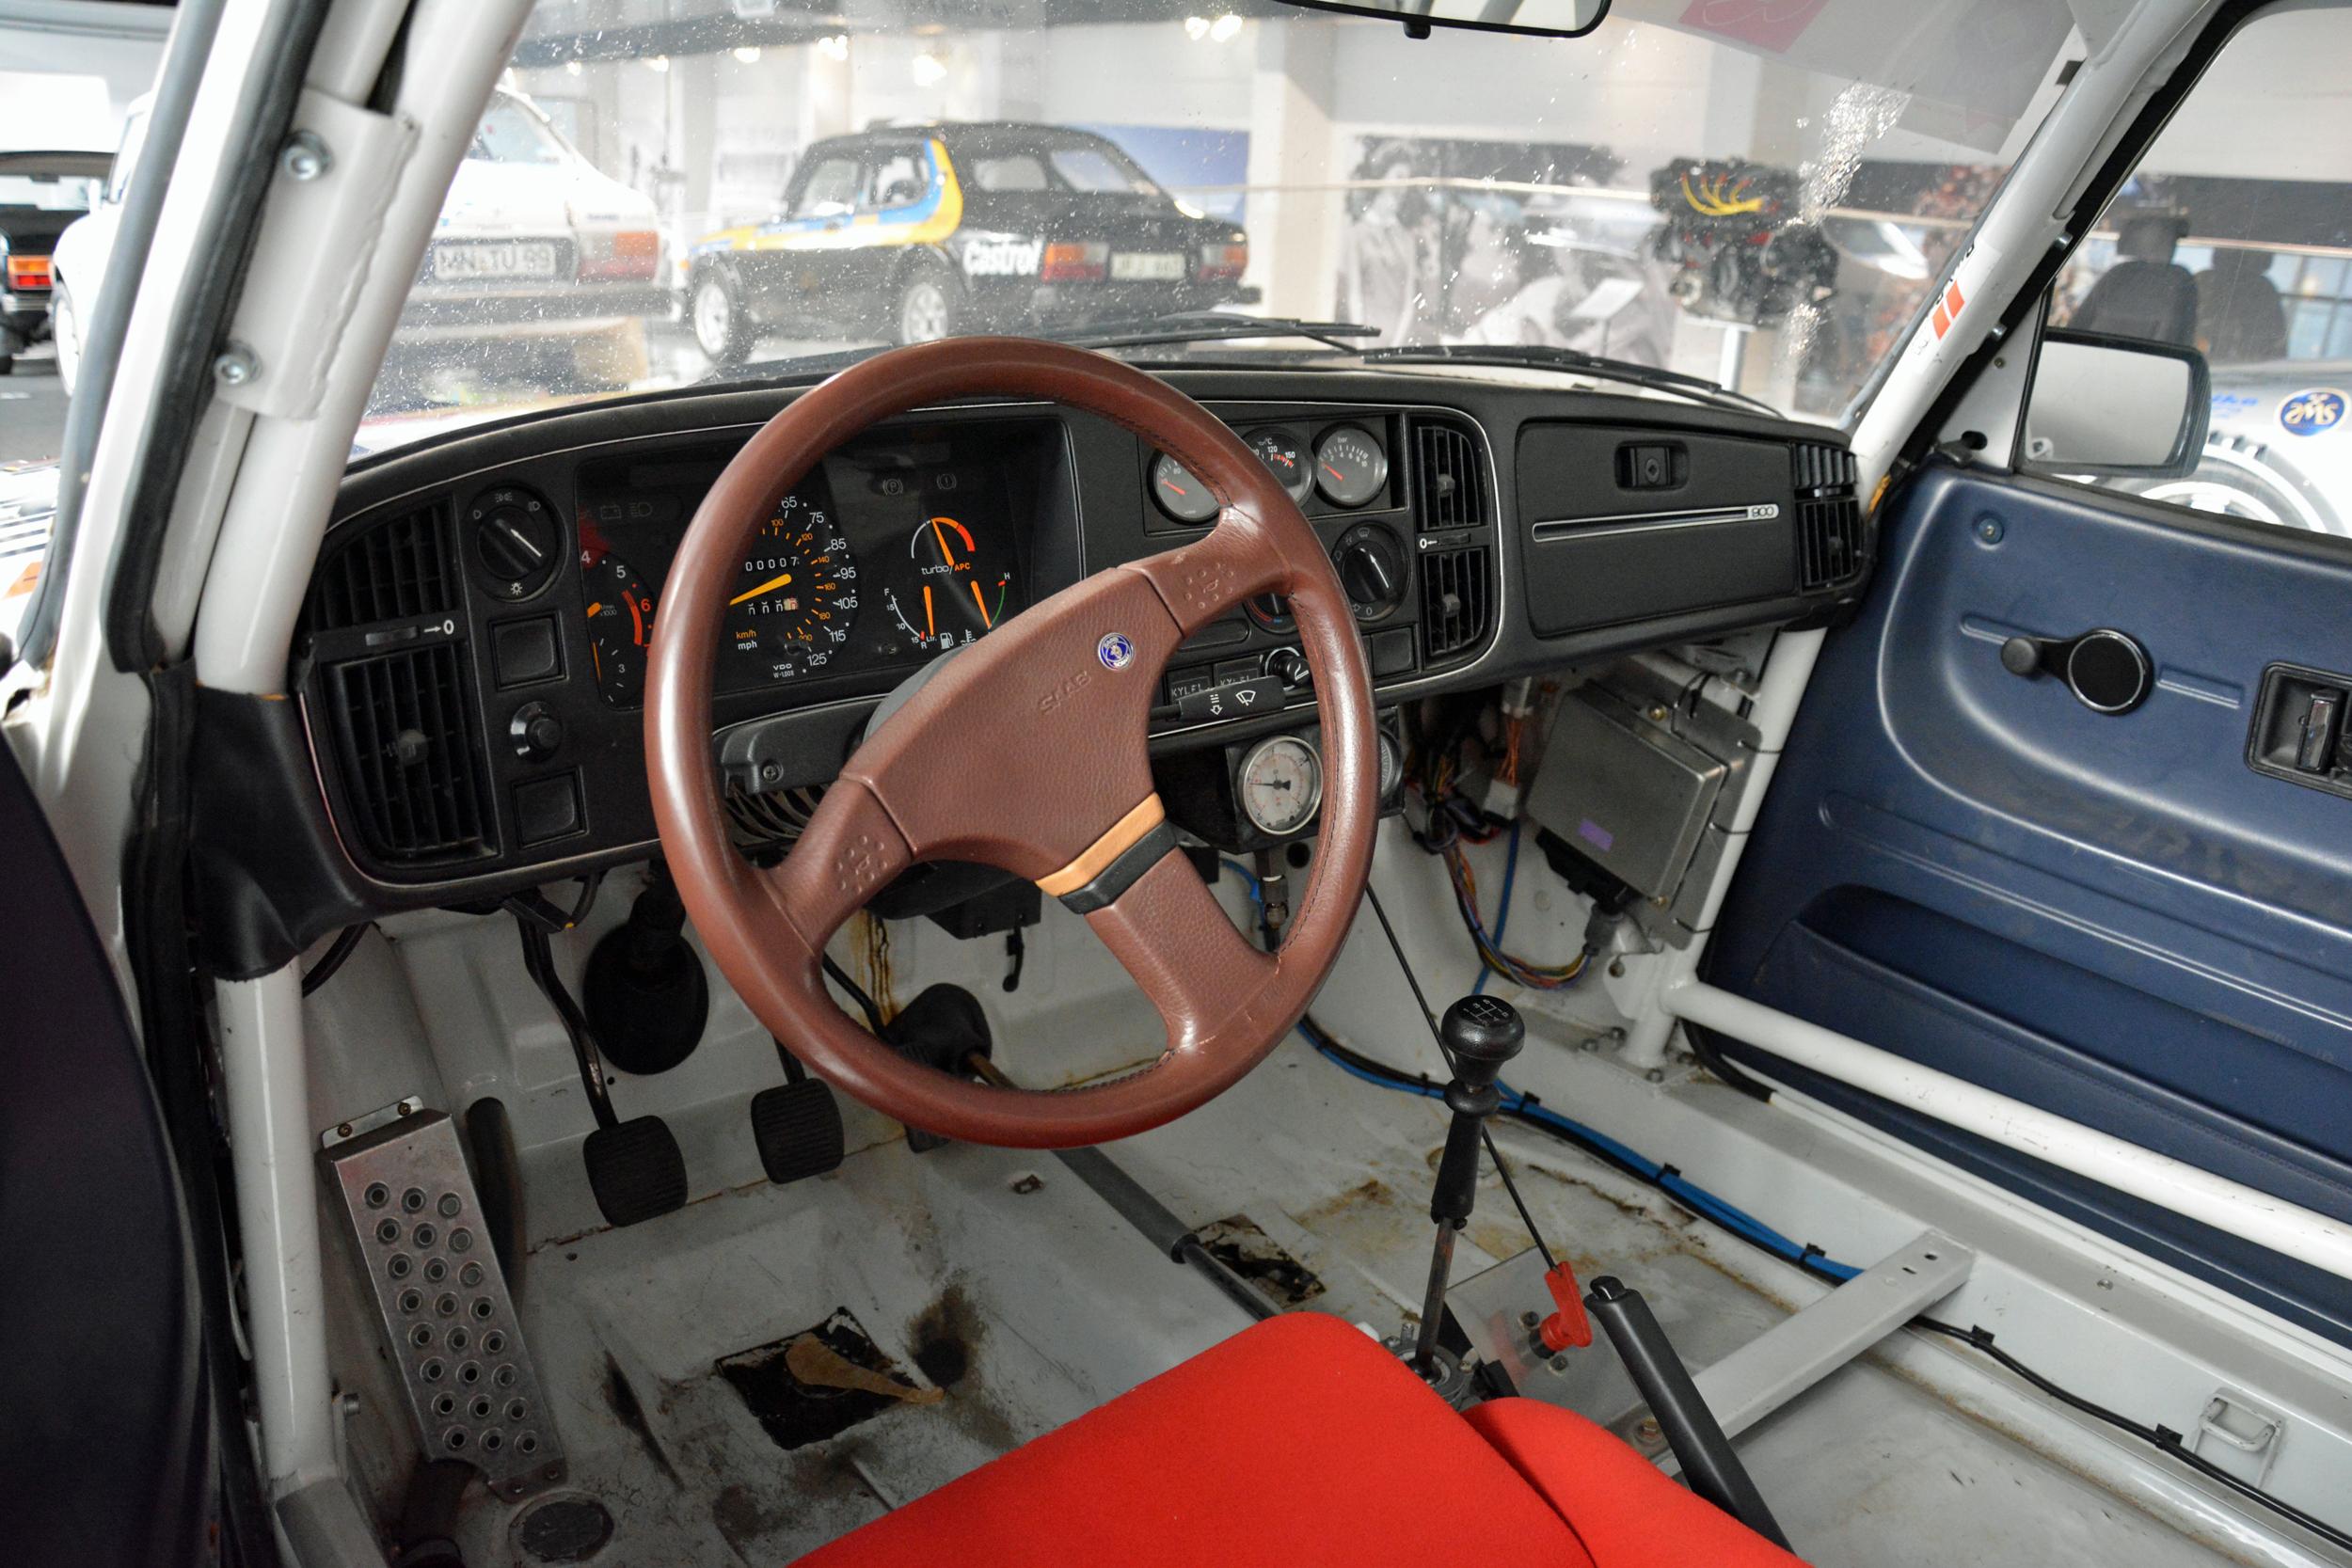 saab museum 900 t16 rally cross wheel